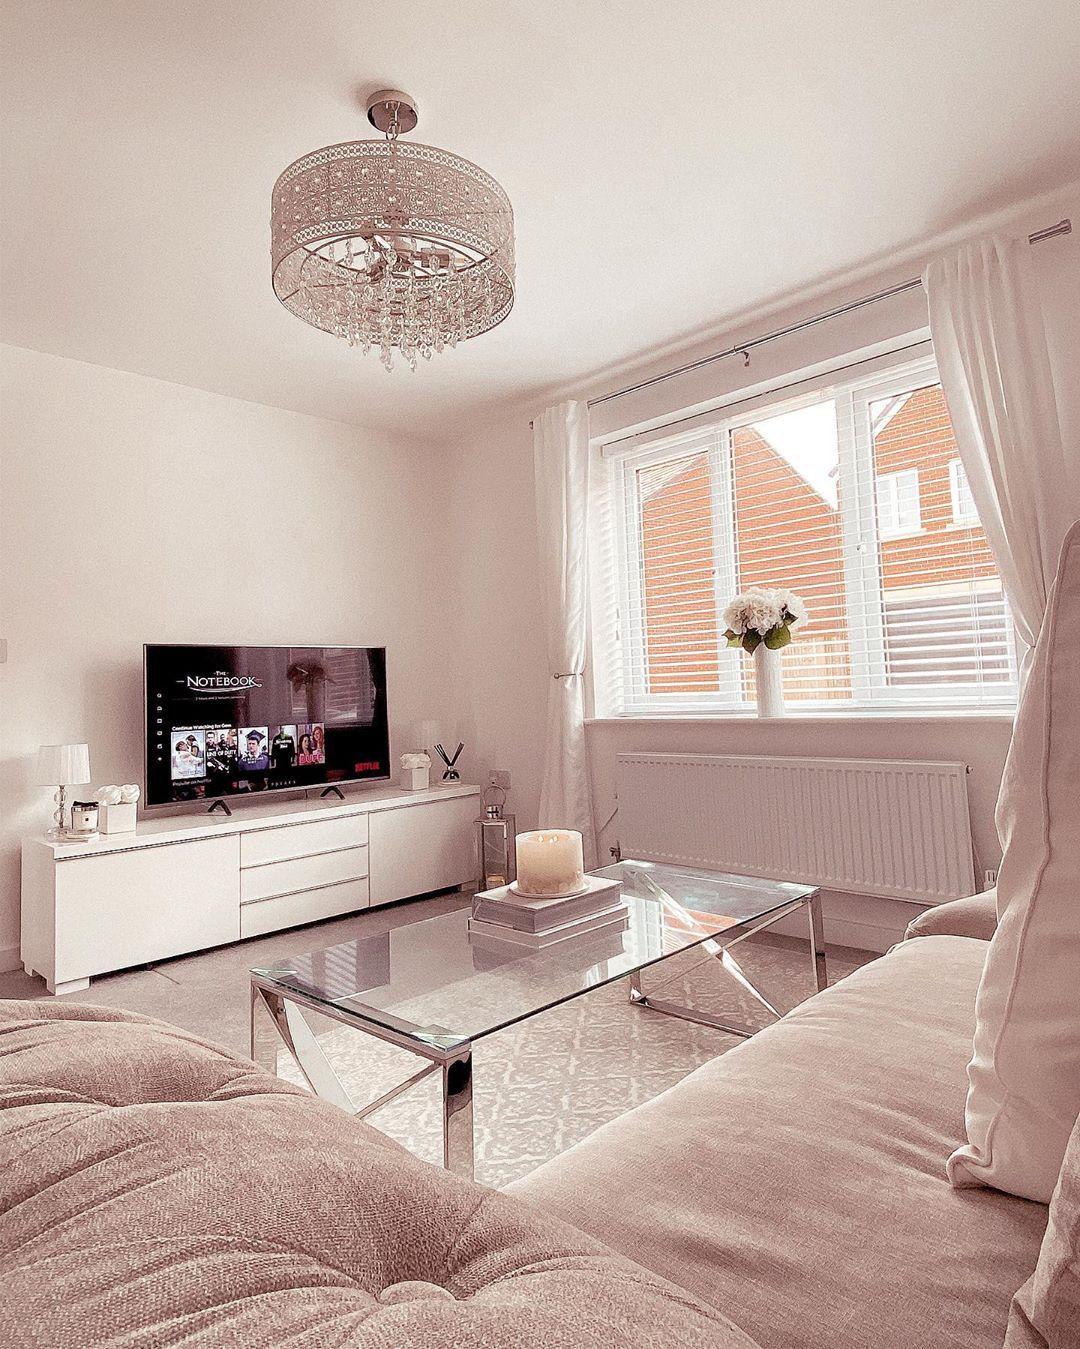 "𝐆𝐄𝐌𝐌𝐀 𝐋𝐎𝐔𝐈𝐒𝐄 𝐀𝐓 𝐇𝐎𝐌𝐄 on Instagram: ""a cosy little evening 🥰      #livingroomdecor #homedecor #home #homeinterioruk #grey #greyinterior #newbuild #newbuildhome…"""